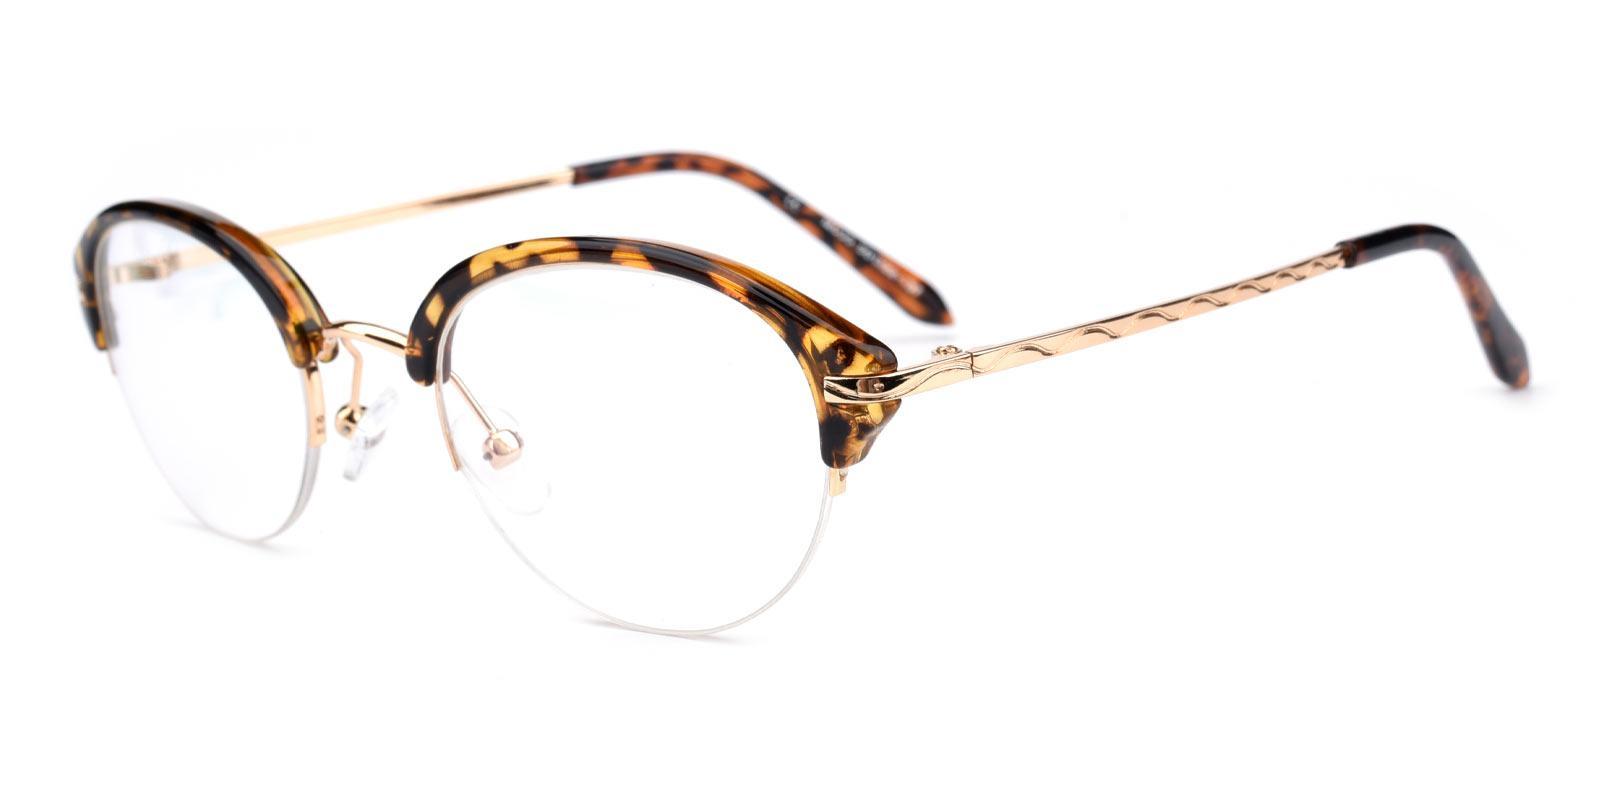 Quiller-Leopard-Oval-TR-Eyeglasses-additional1